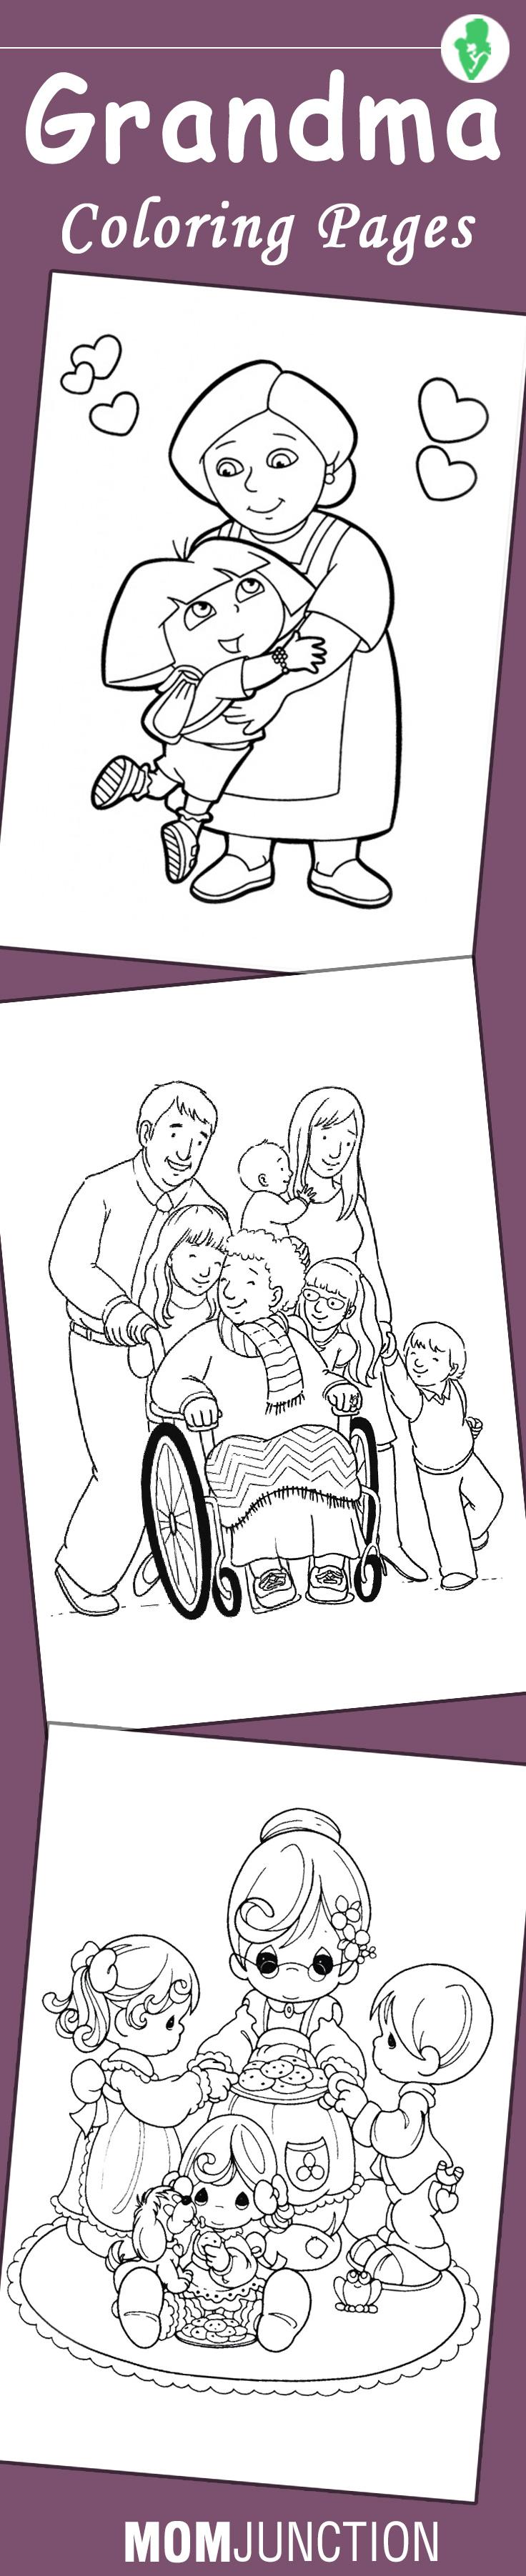 top 10 free printable grandma coloring pages online free printable